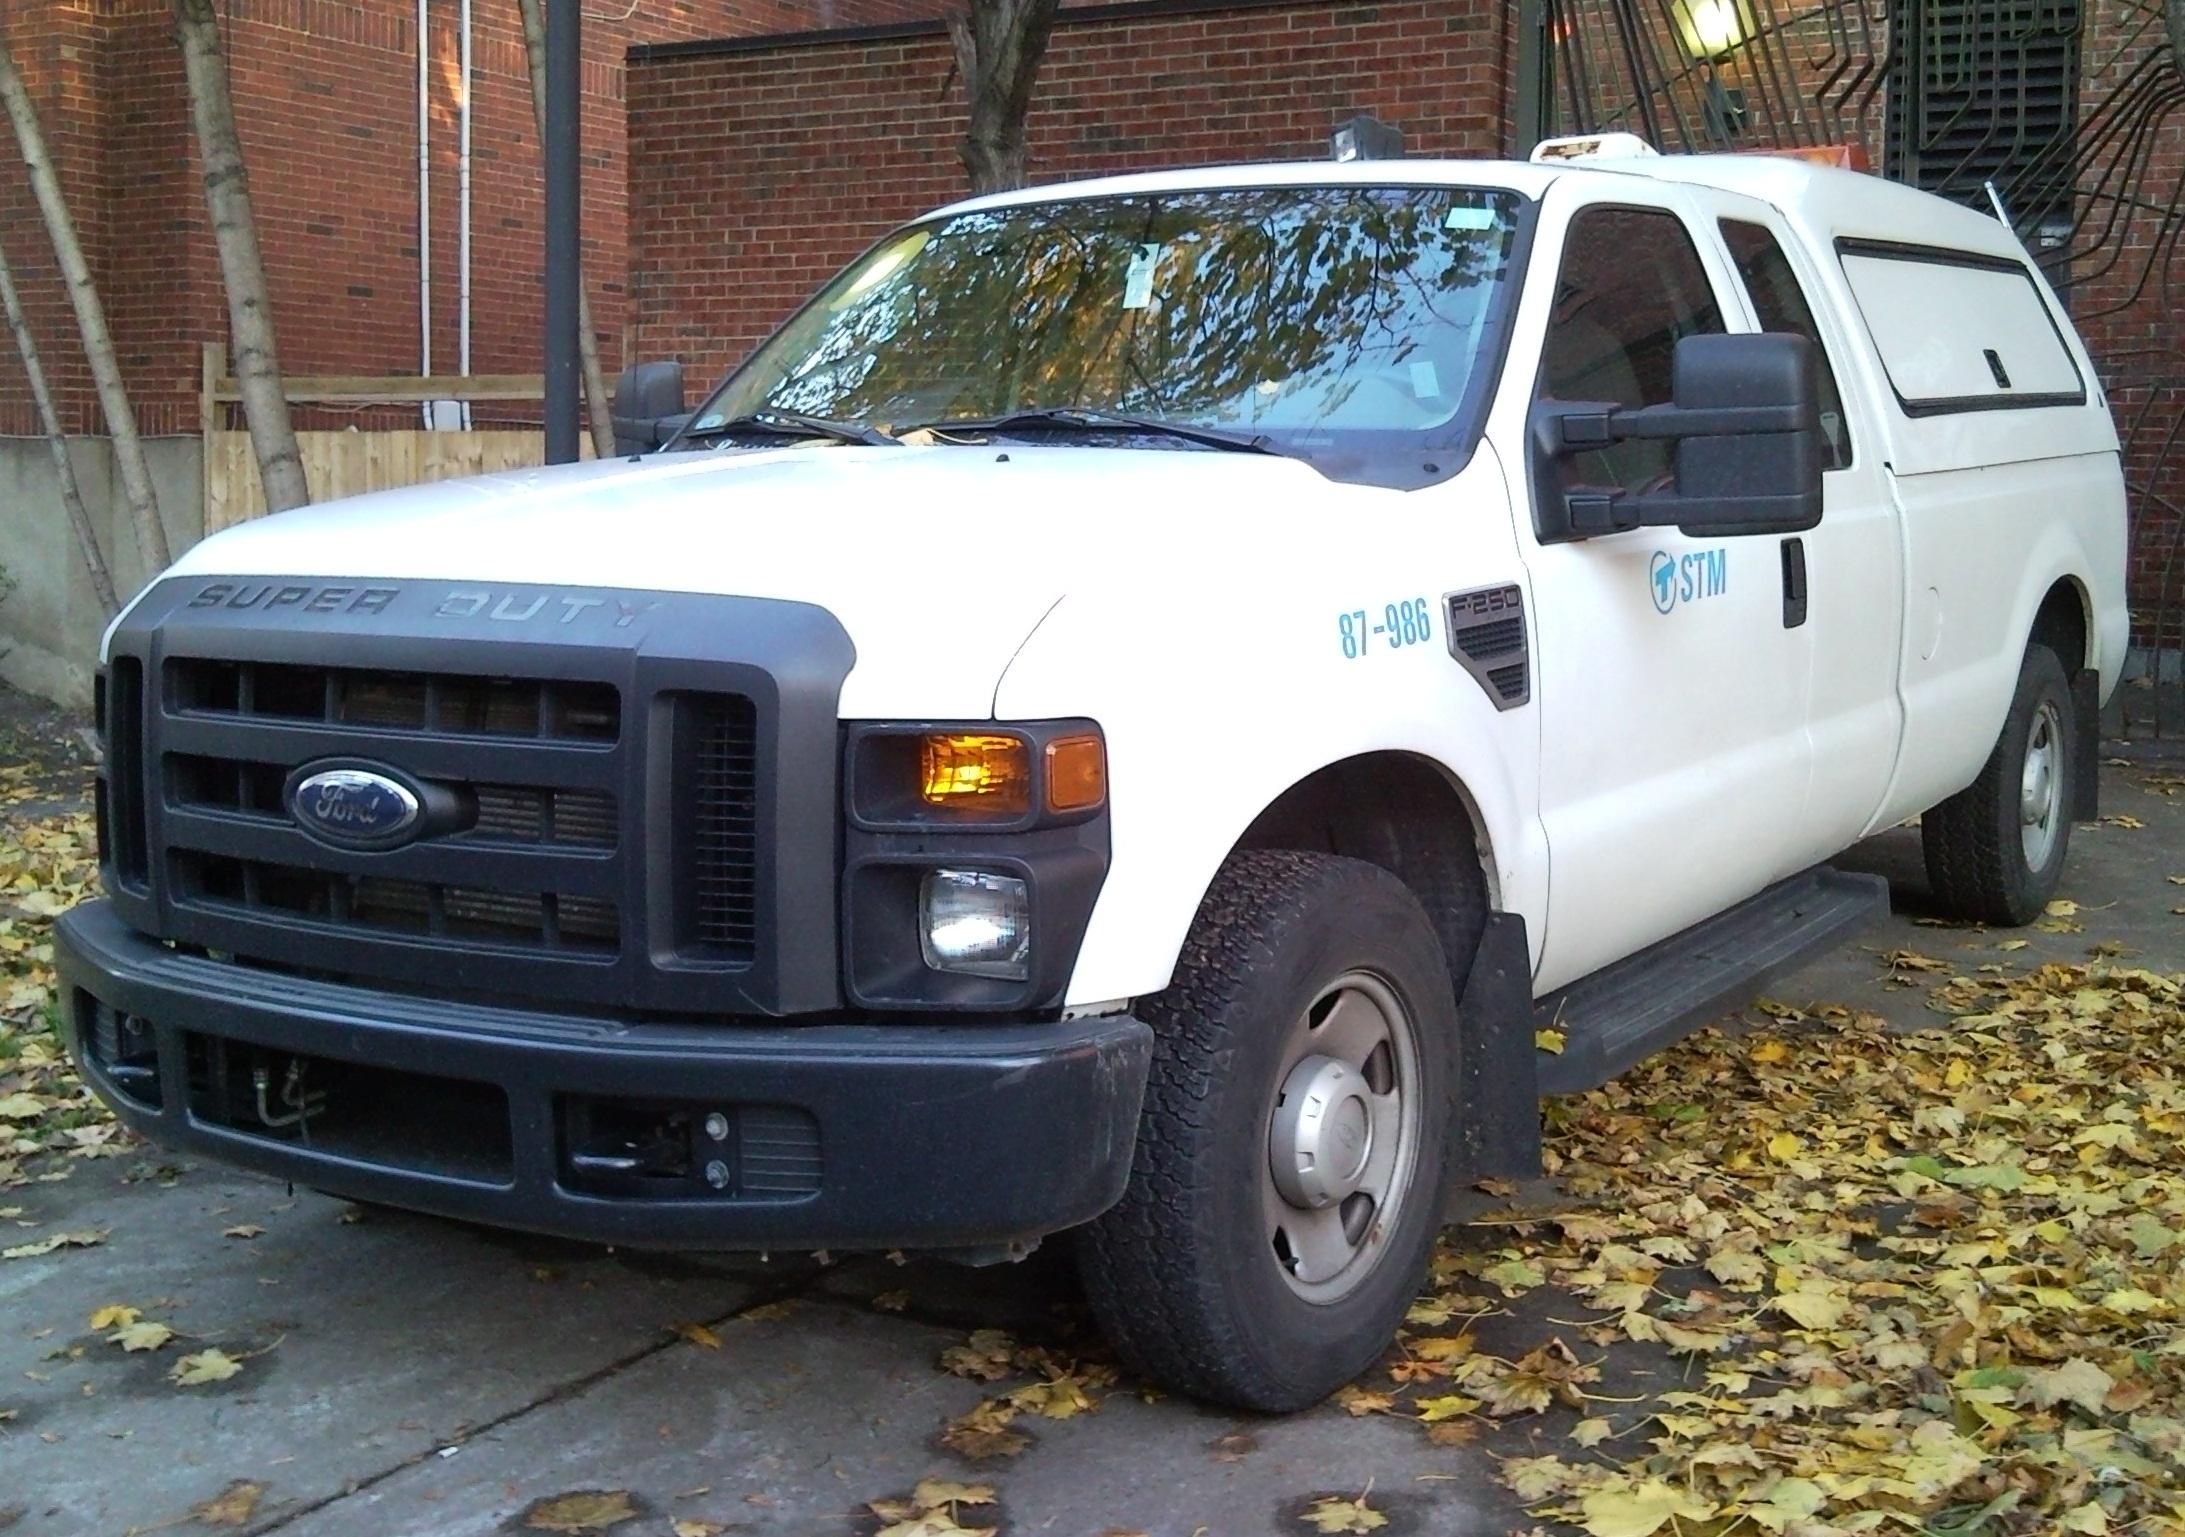 2008 ford f250 super duty extended cab. Black Bedroom Furniture Sets. Home Design Ideas